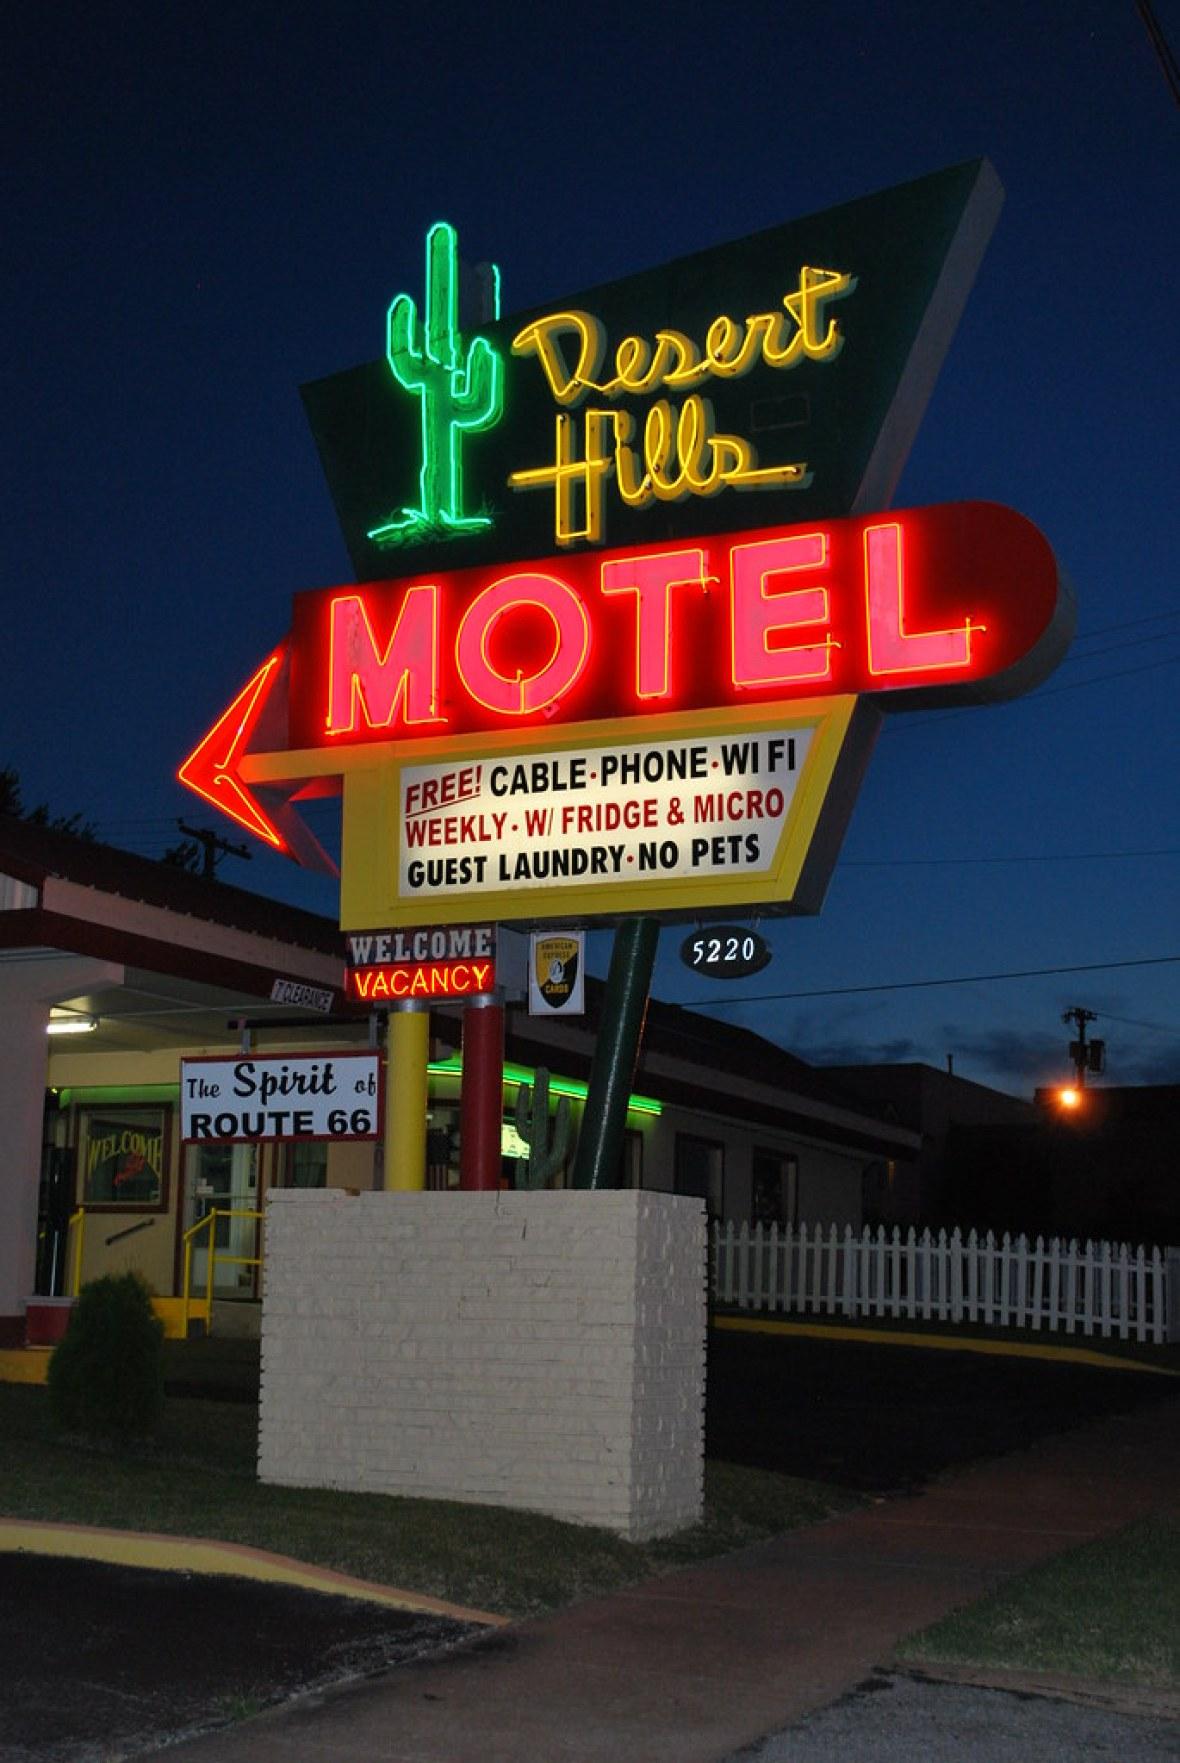 Desert Hills Motel - 5220 East 11th Street, Tulsa, Oklahoma U.S.A. - June 10, 2015